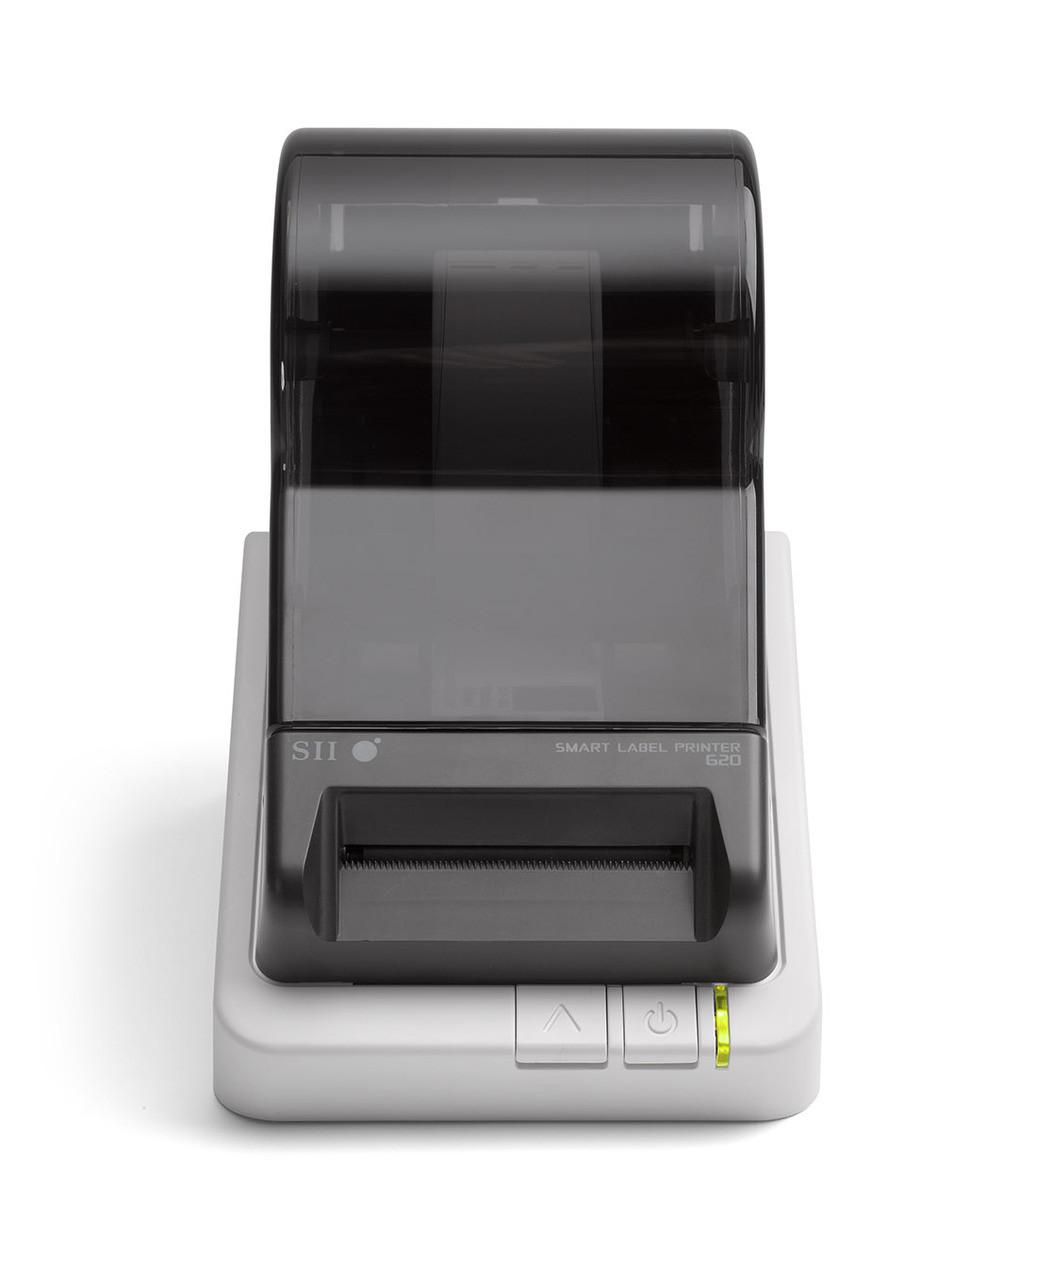 Seiko SLP 620 label printer, front view